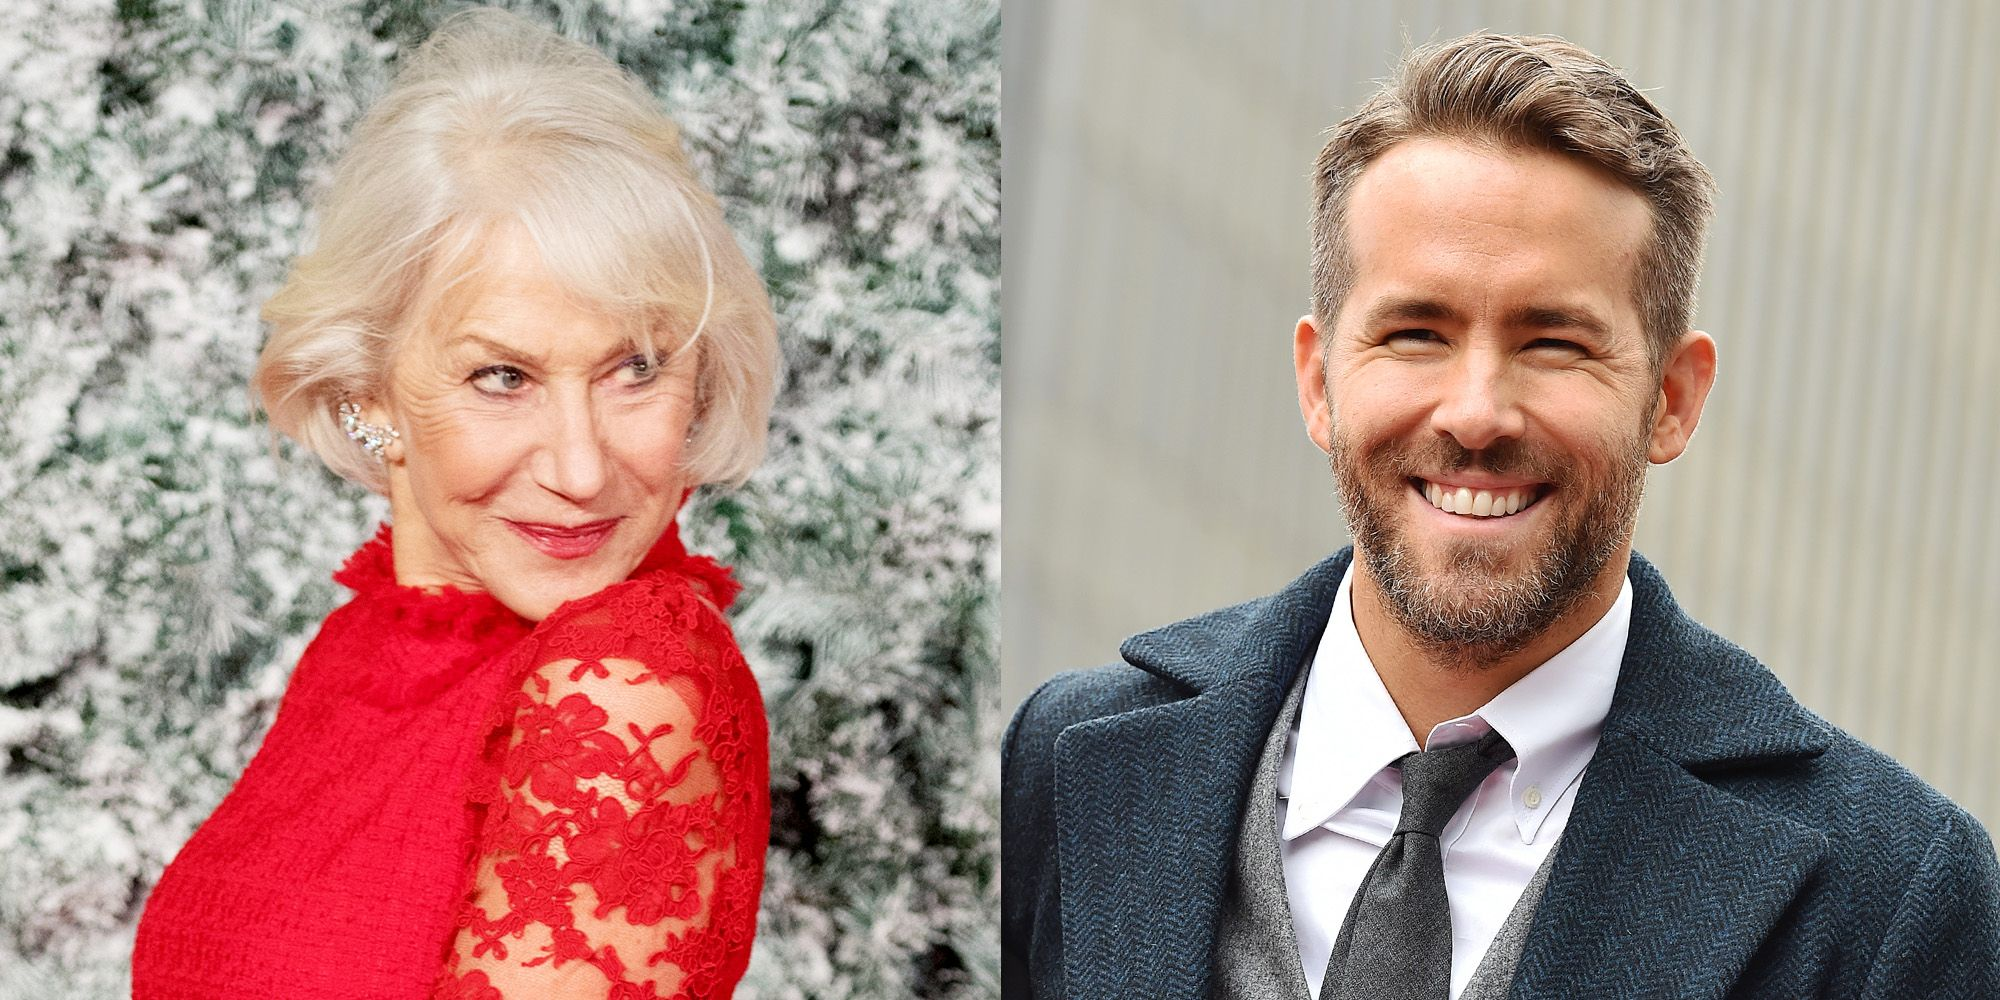 Helen Mirren Just Wrote Something About Ryan Reynolds That Made Us Blush